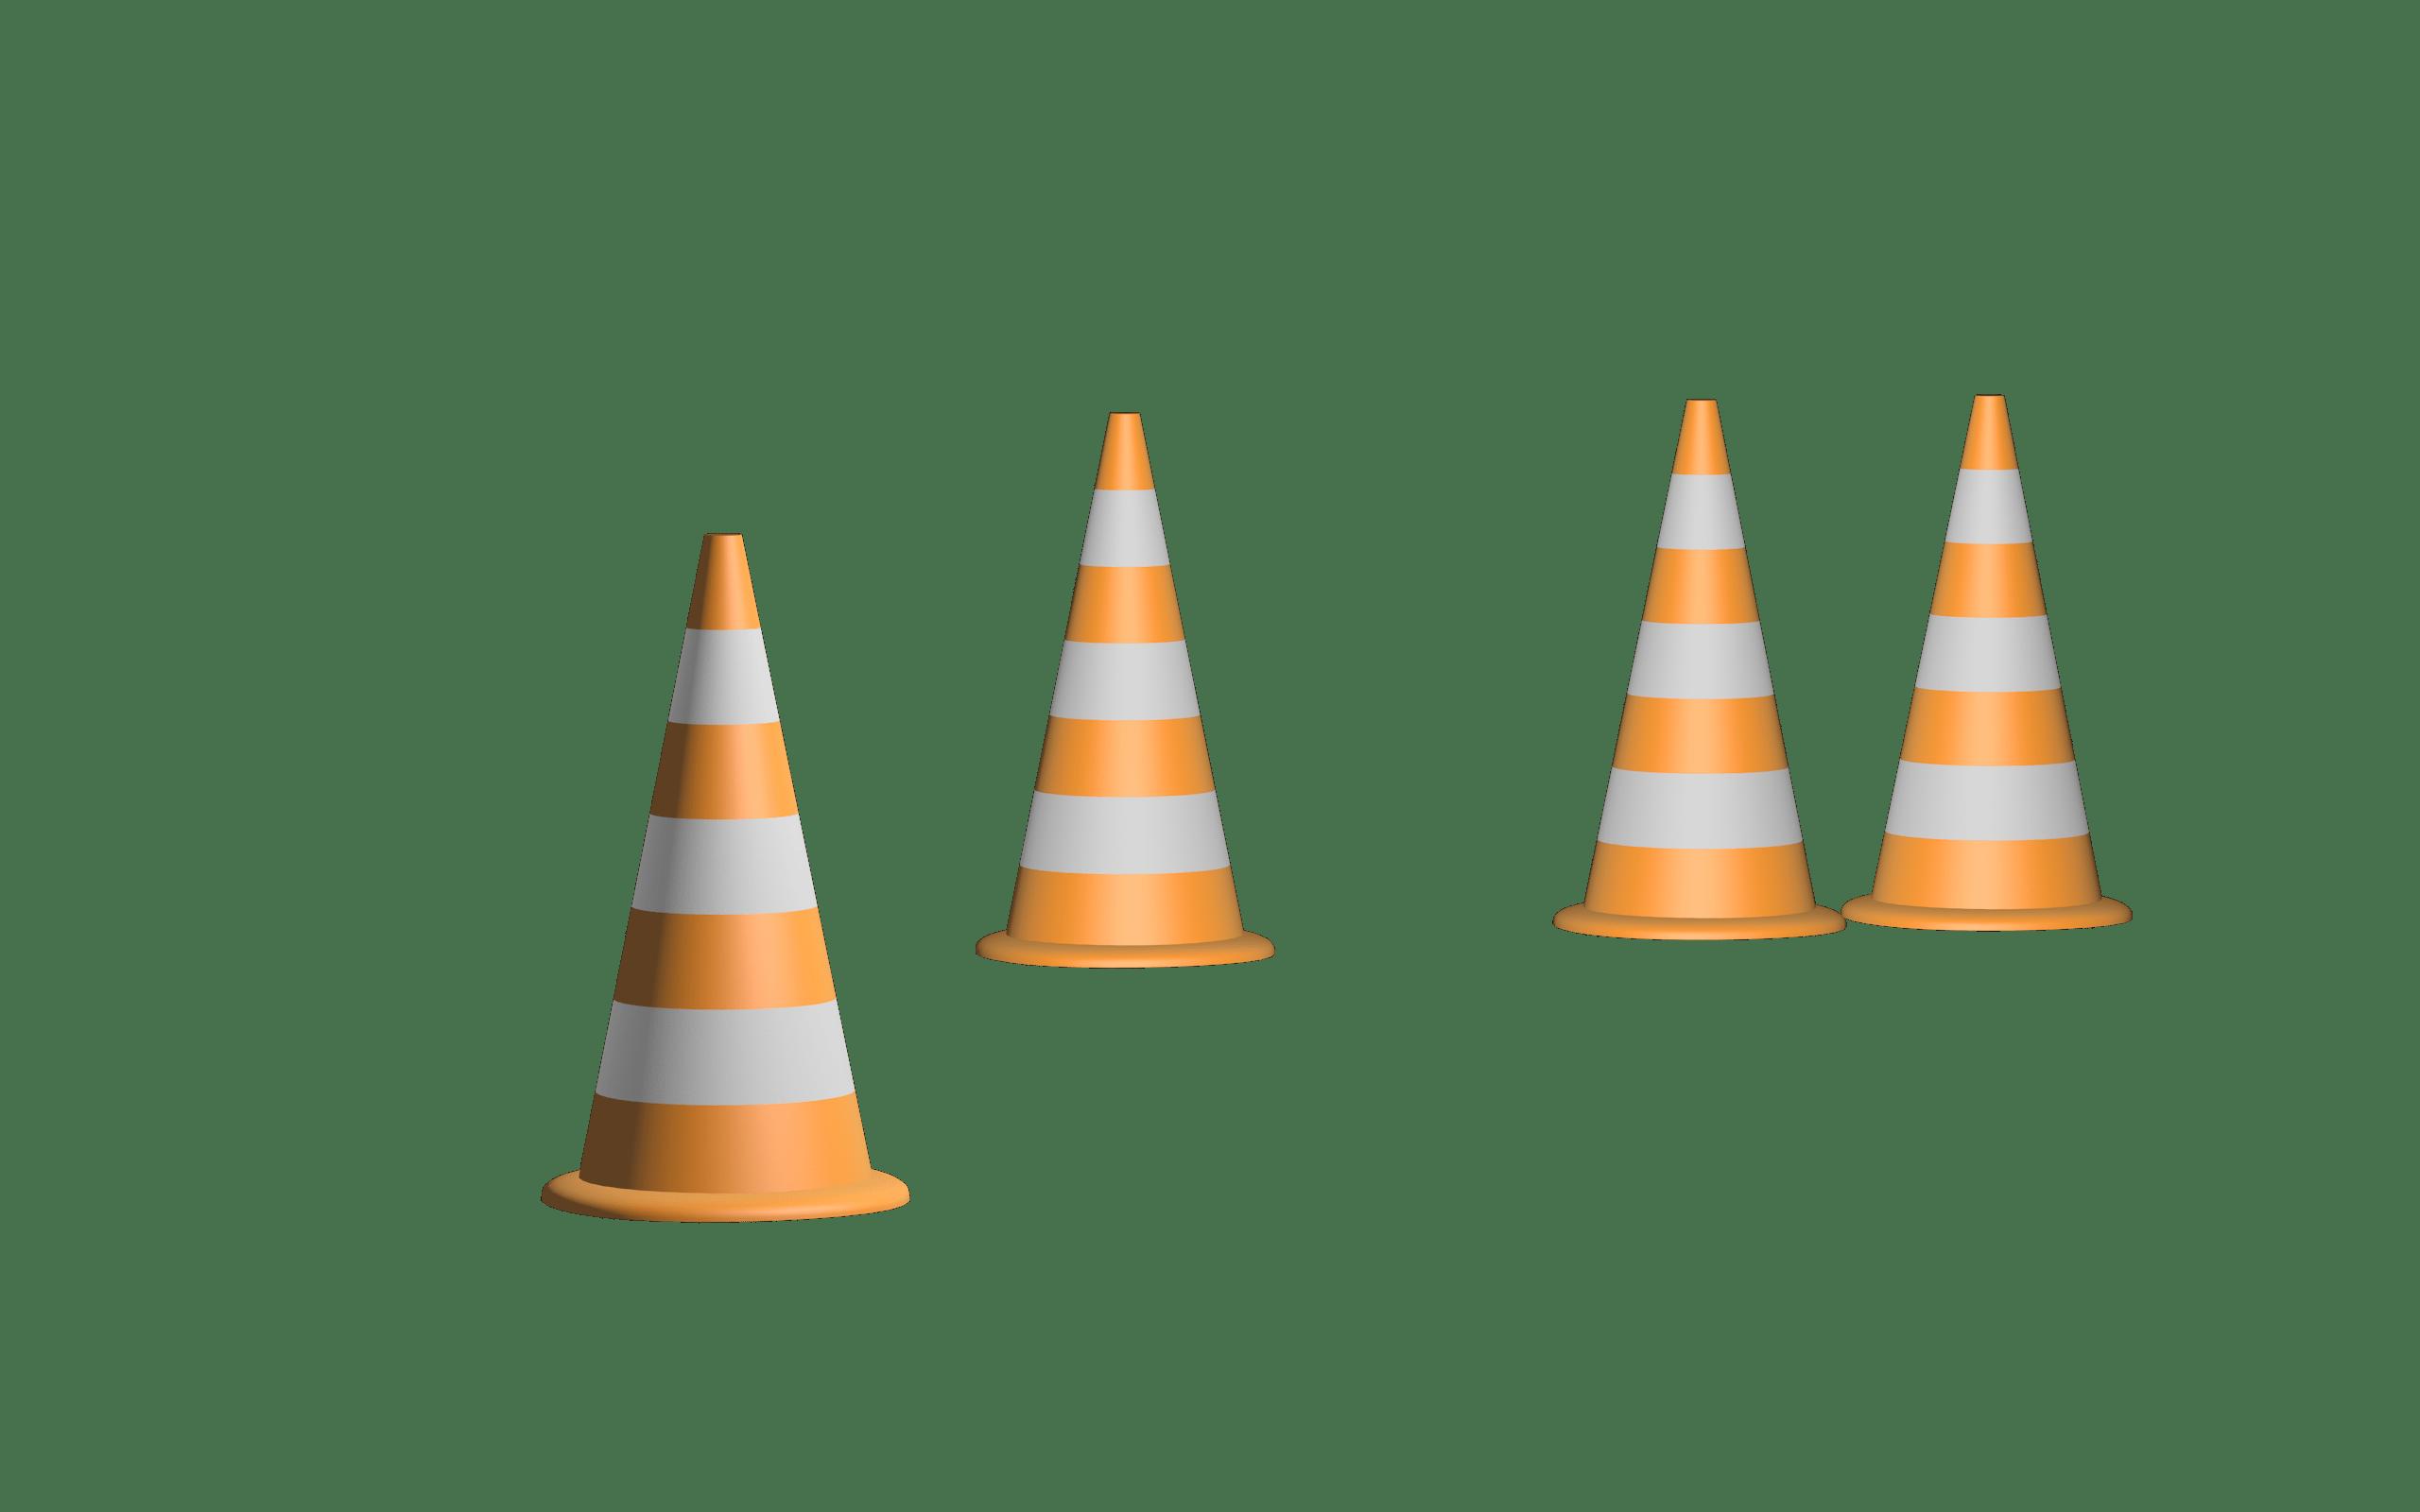 baukegel, shield, cone